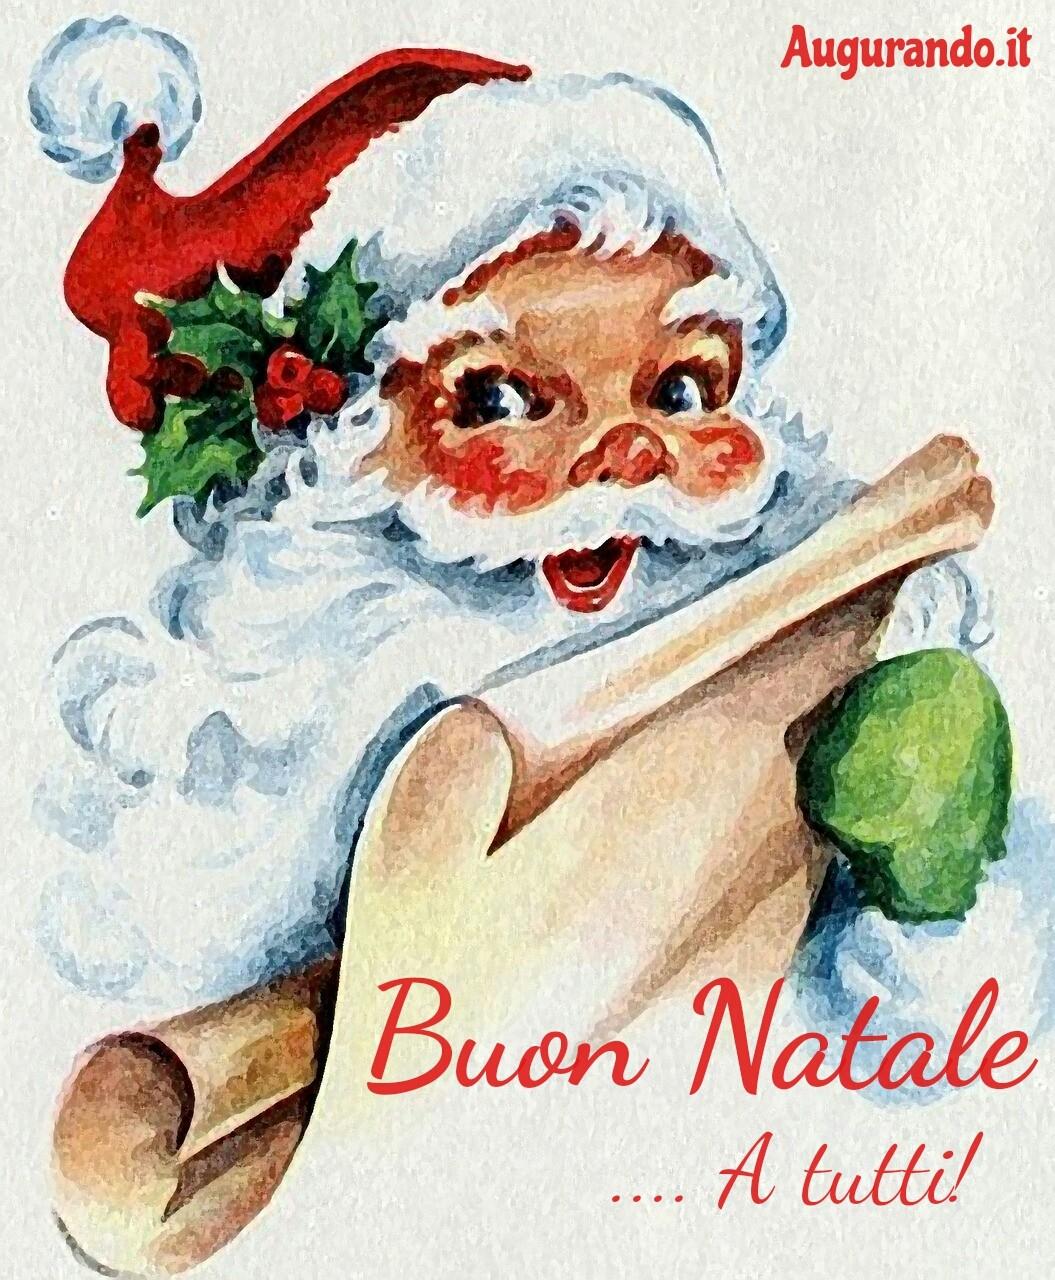 Buon Natale, Natale, felice Natale, Marry Christmas, Buon Natale a tutti, immagini Buon Natale, dolce Natale